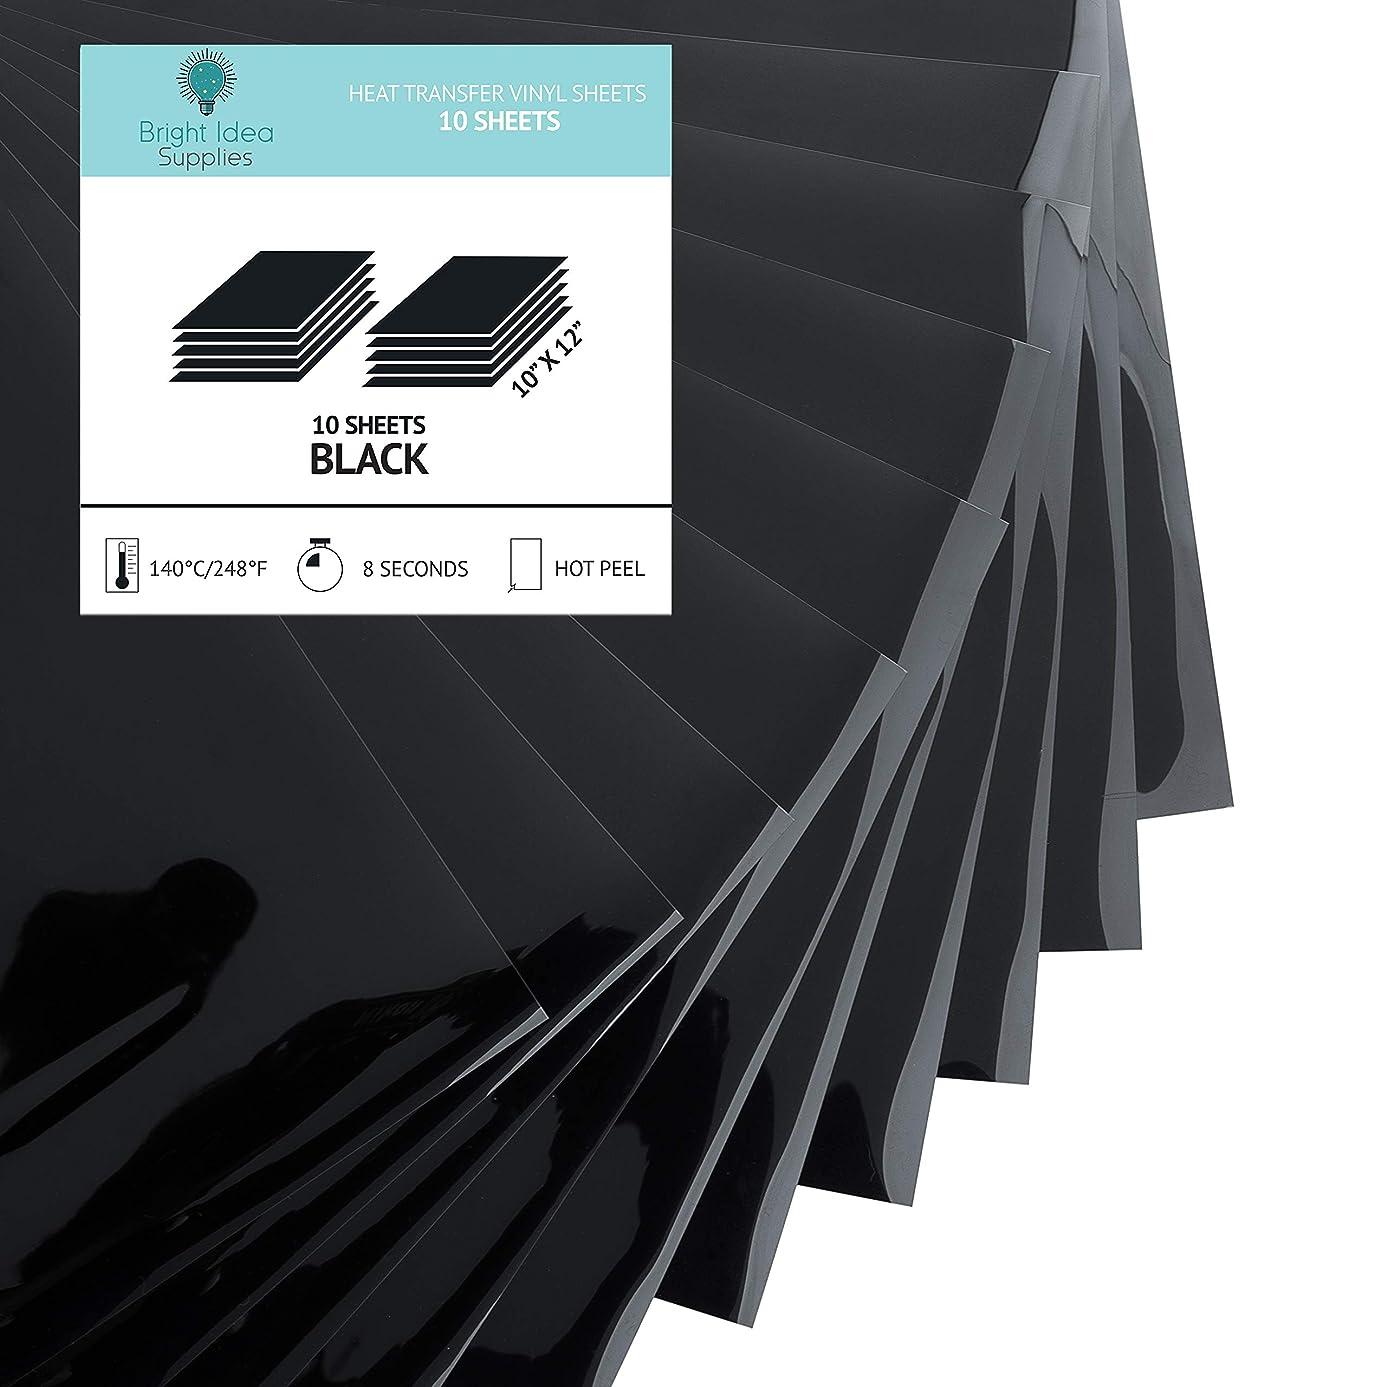 Bright IDEA Heat Transfer Vinyl HTV Bundle - 10 Pack of Premium Black HTV Sheets - Iron On T-Shirt Vinyl Transfer Sheets - Best HTV Vinyl for Silhouette Cameo, Cricut, Heat Press